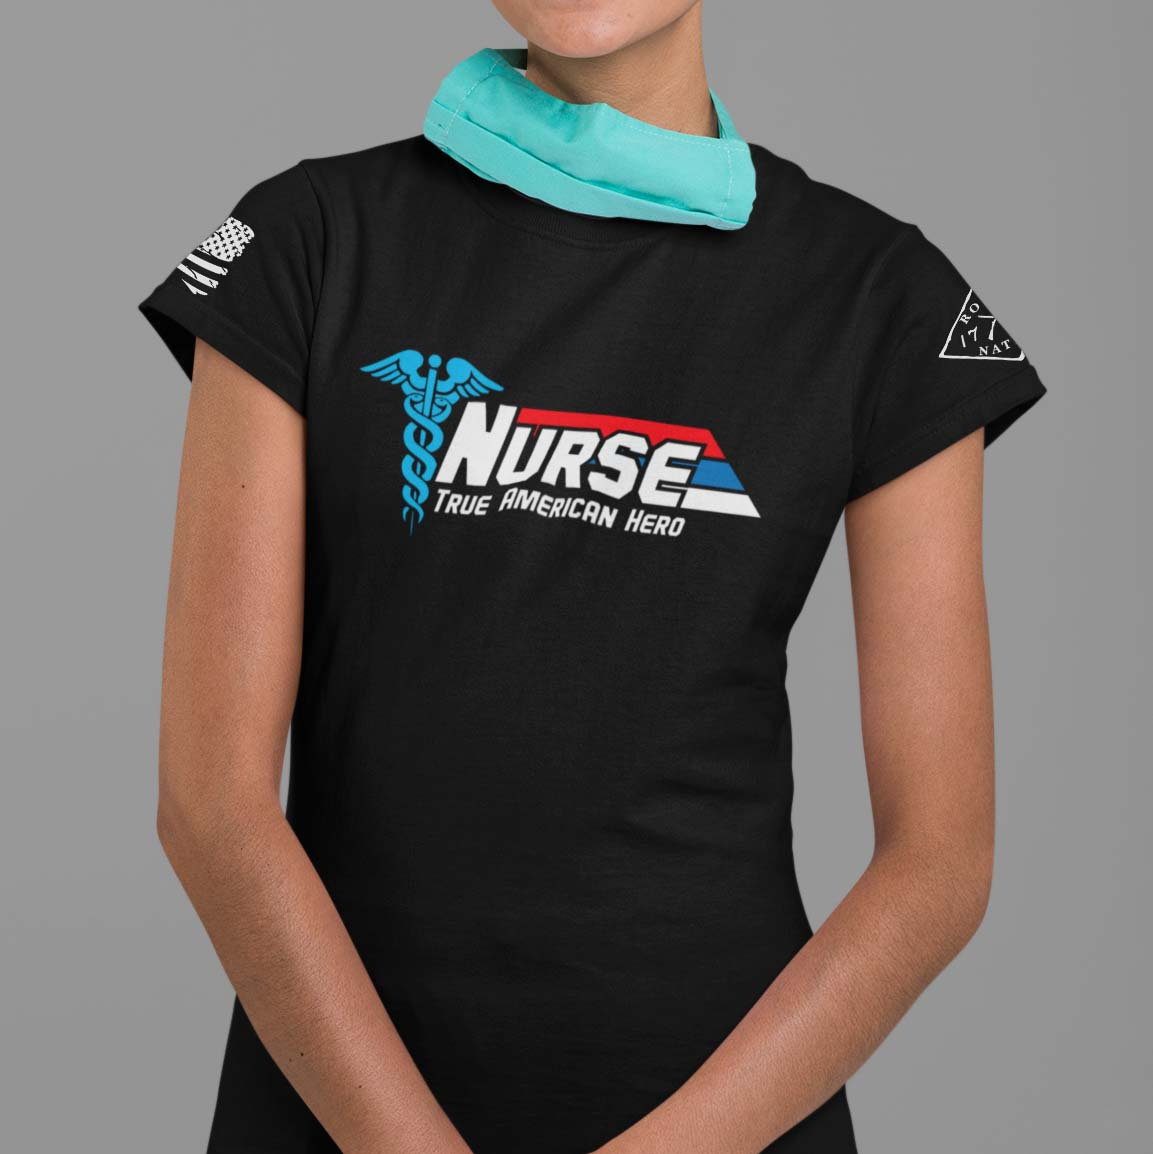 Nurse-True American Hero on women's black t-shirt